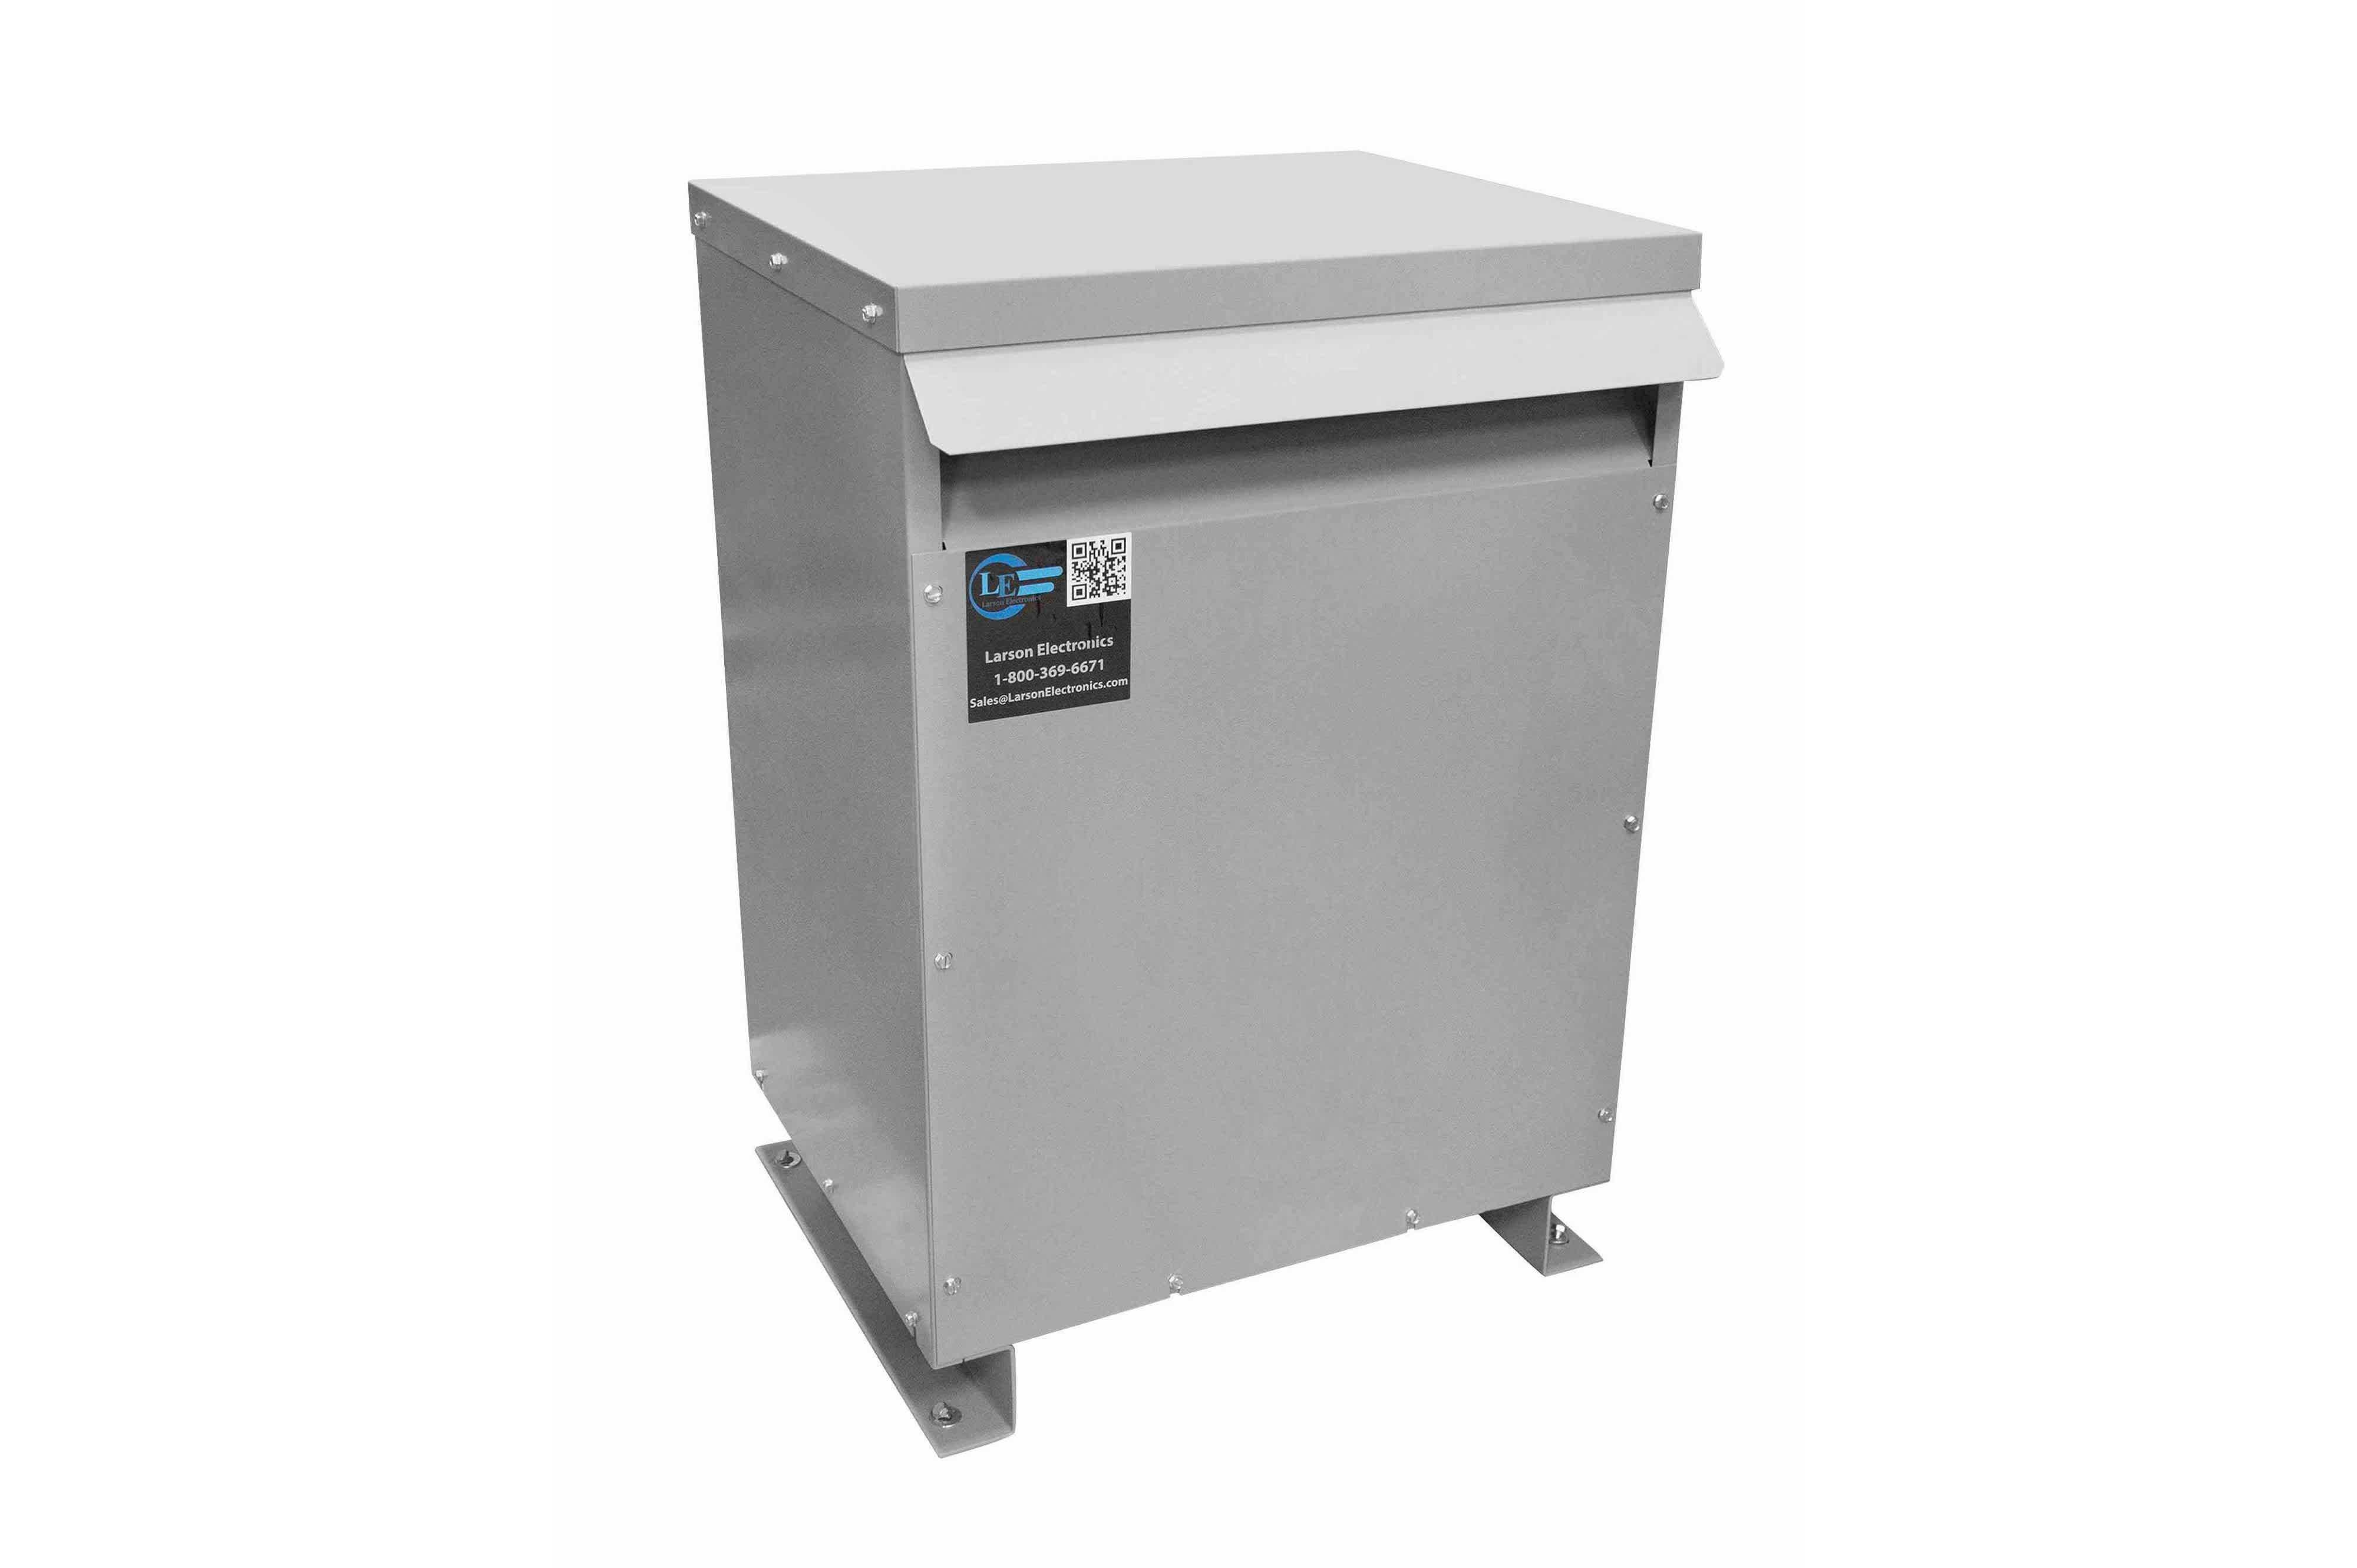 30 kVA 3PH DOE Transformer, 440V Delta Primary, 208Y/120 Wye-N Secondary, N3R, Ventilated, 60 Hz